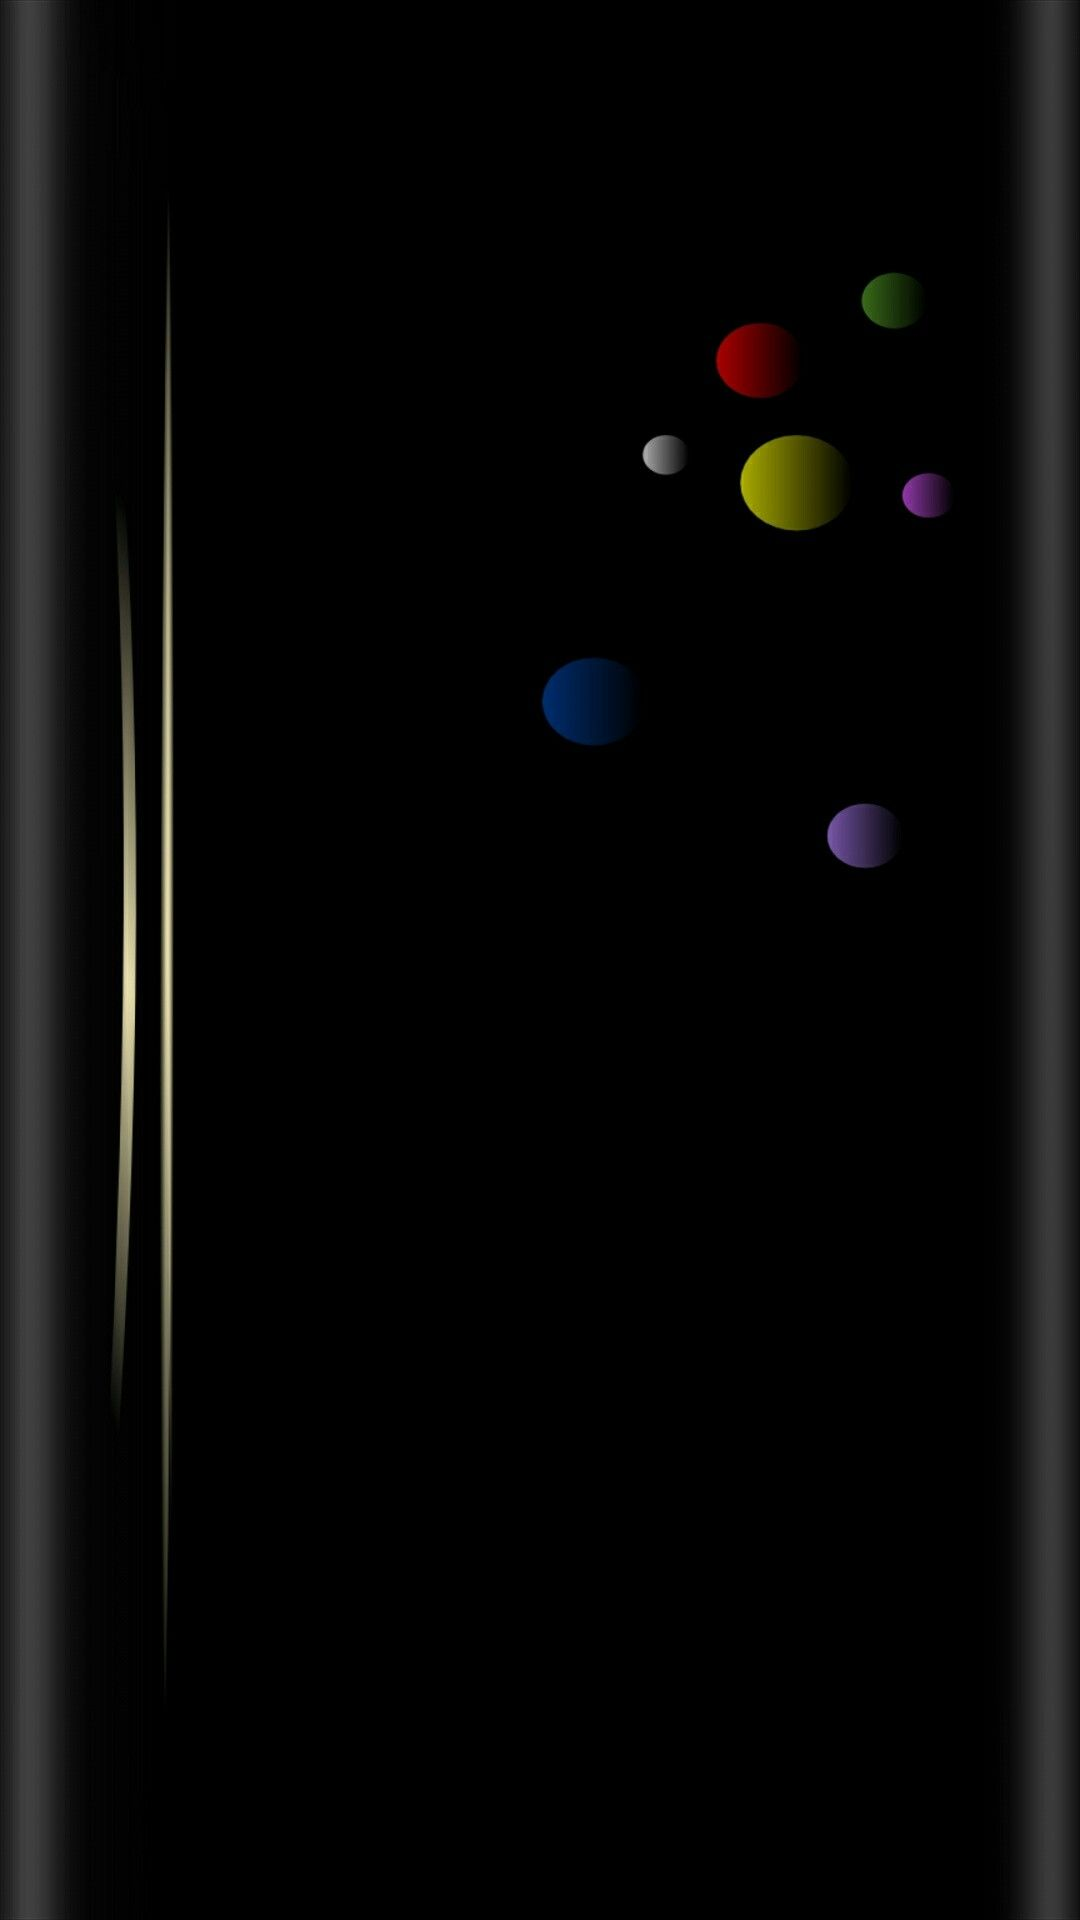 Samsung Iphone Edge Phone Telefon Hd Wallpaper Resim Duvari Renkler Resim